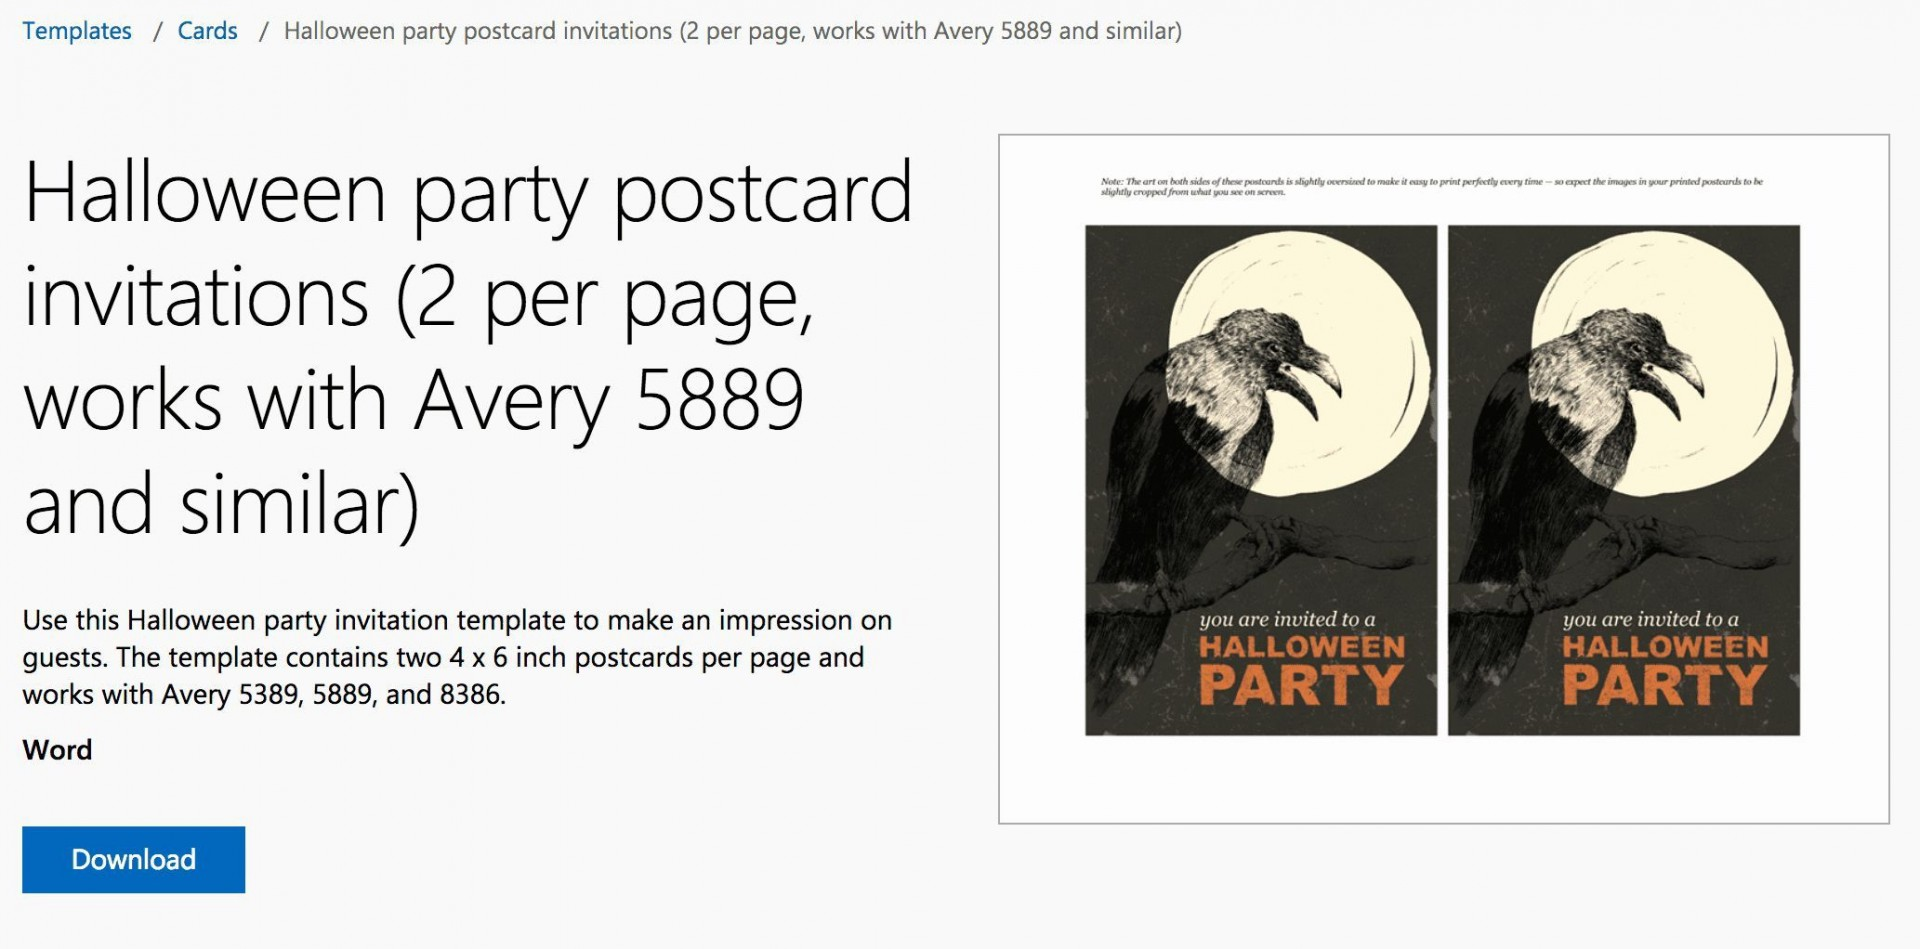 004 Fantastic Microsoft Word Invitation Template 2 Per Page Example 1920